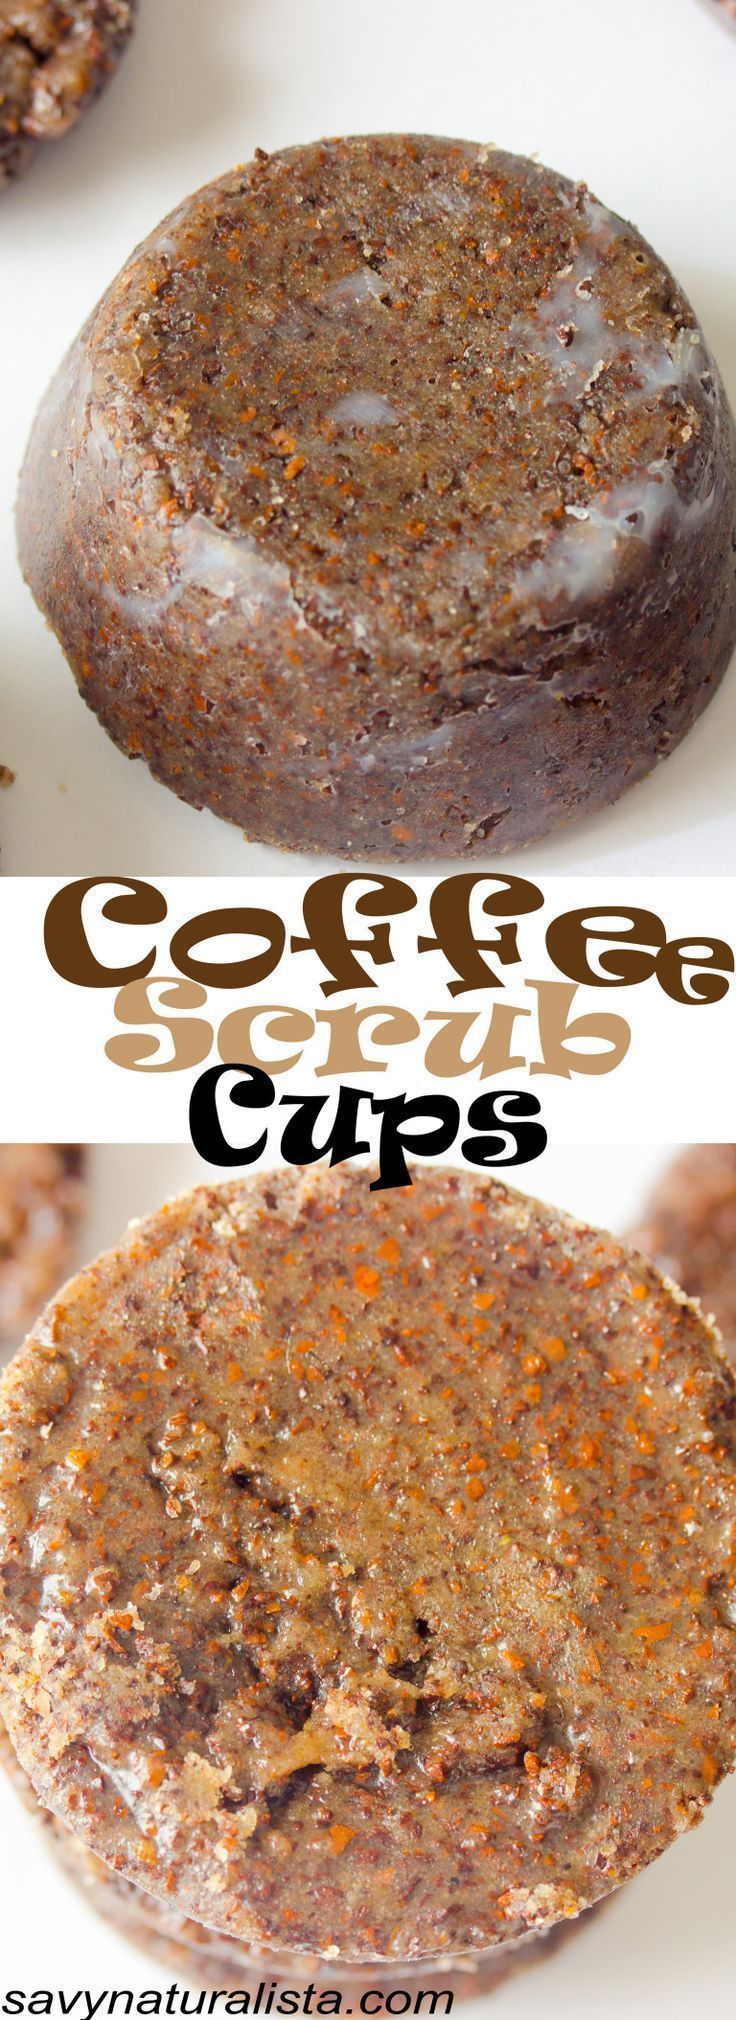 Coffee Scrub Cups